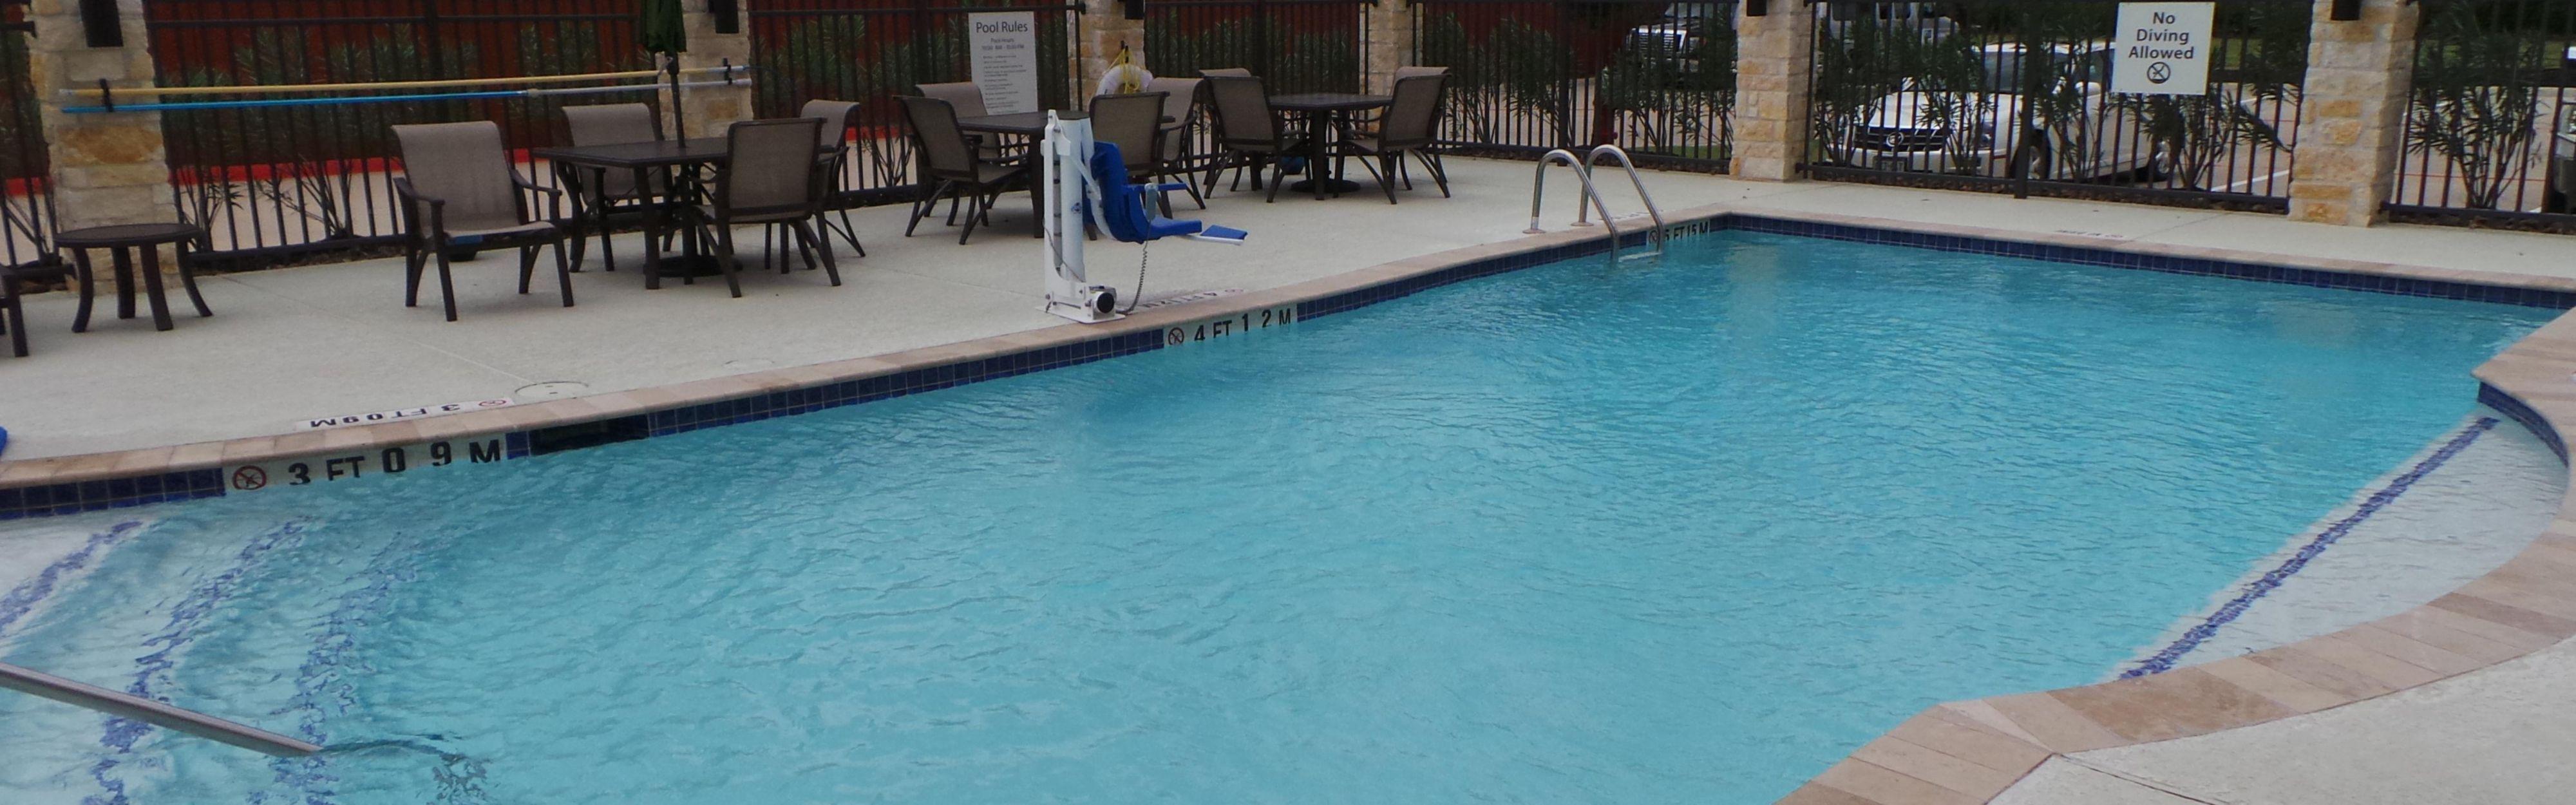 Holiday Inn Express & Suites Atascocita - Humble - Kingwood image 2